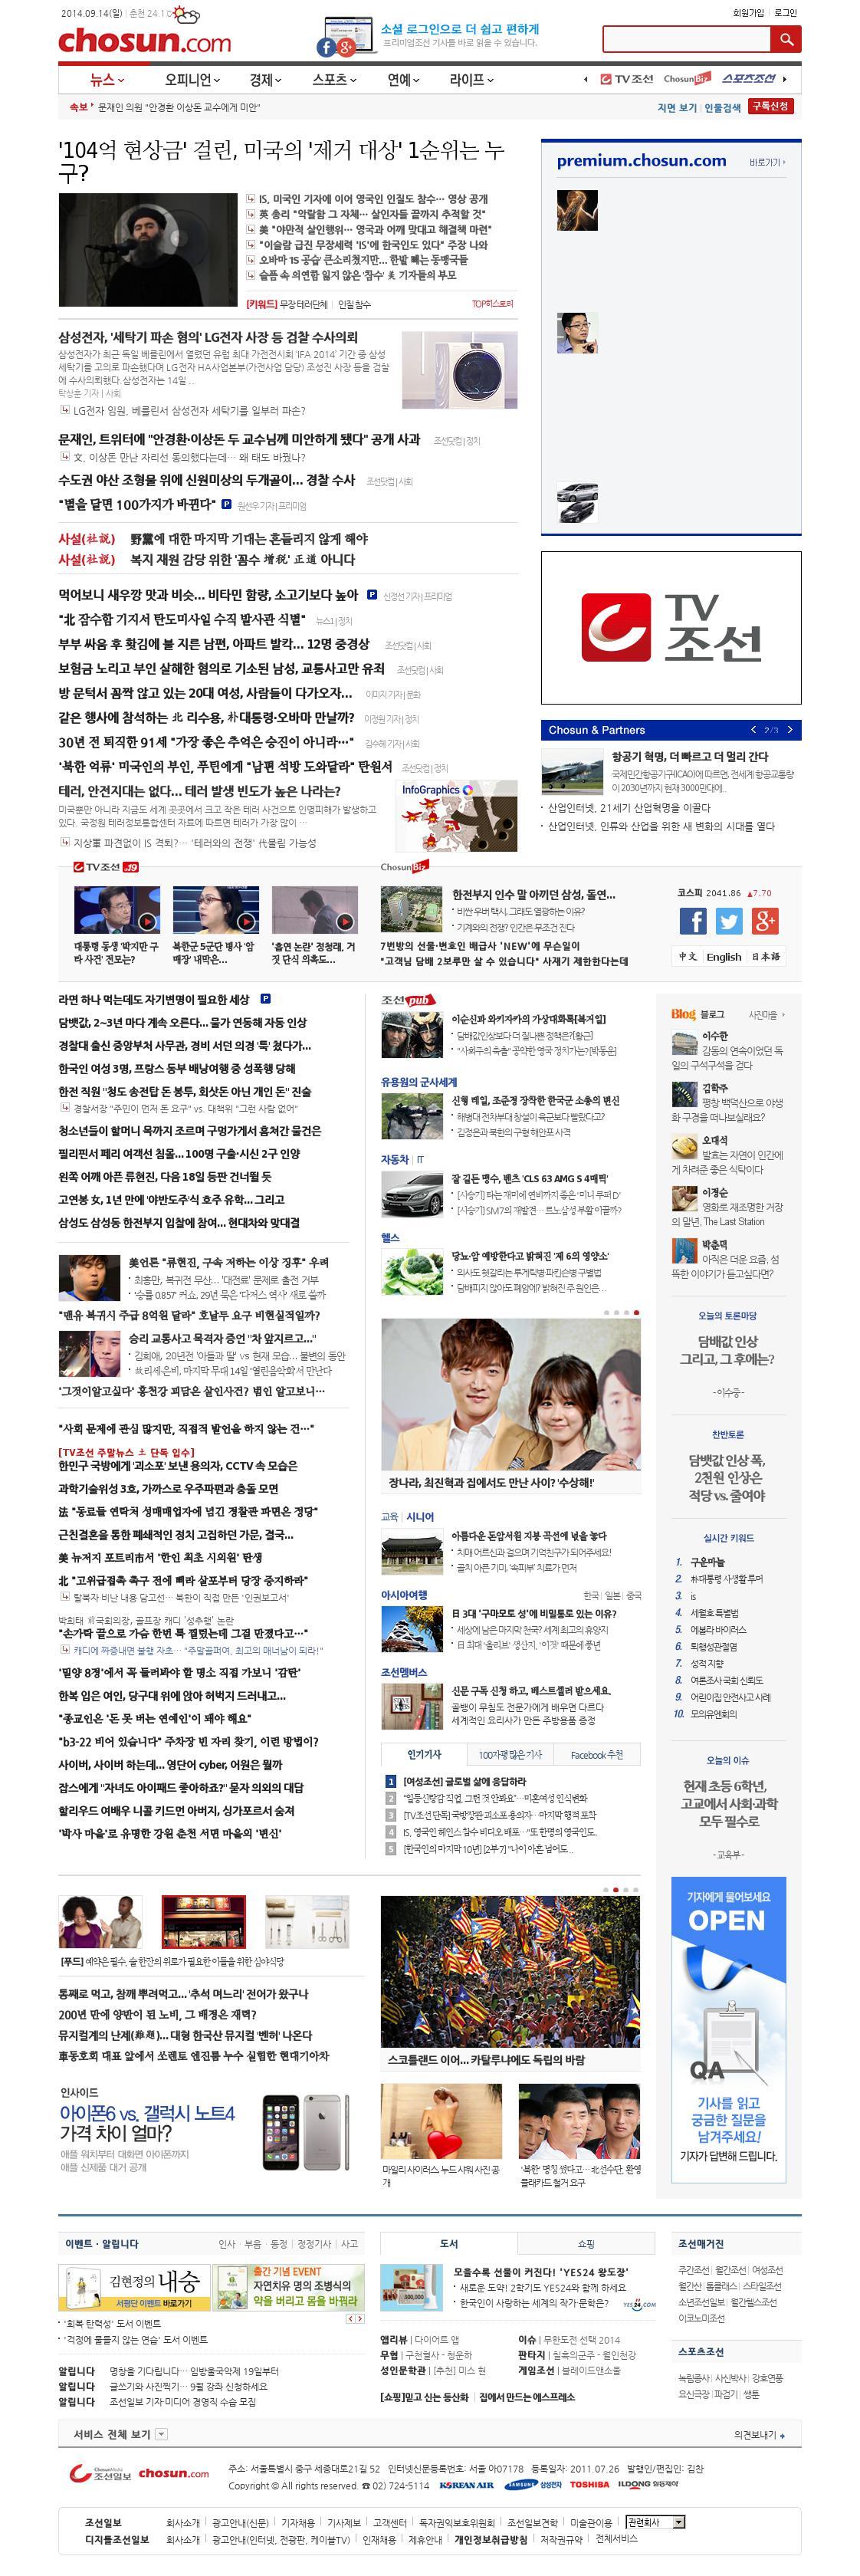 chosun.com at Sunday Sept. 14, 2014, 5:02 a.m. UTC